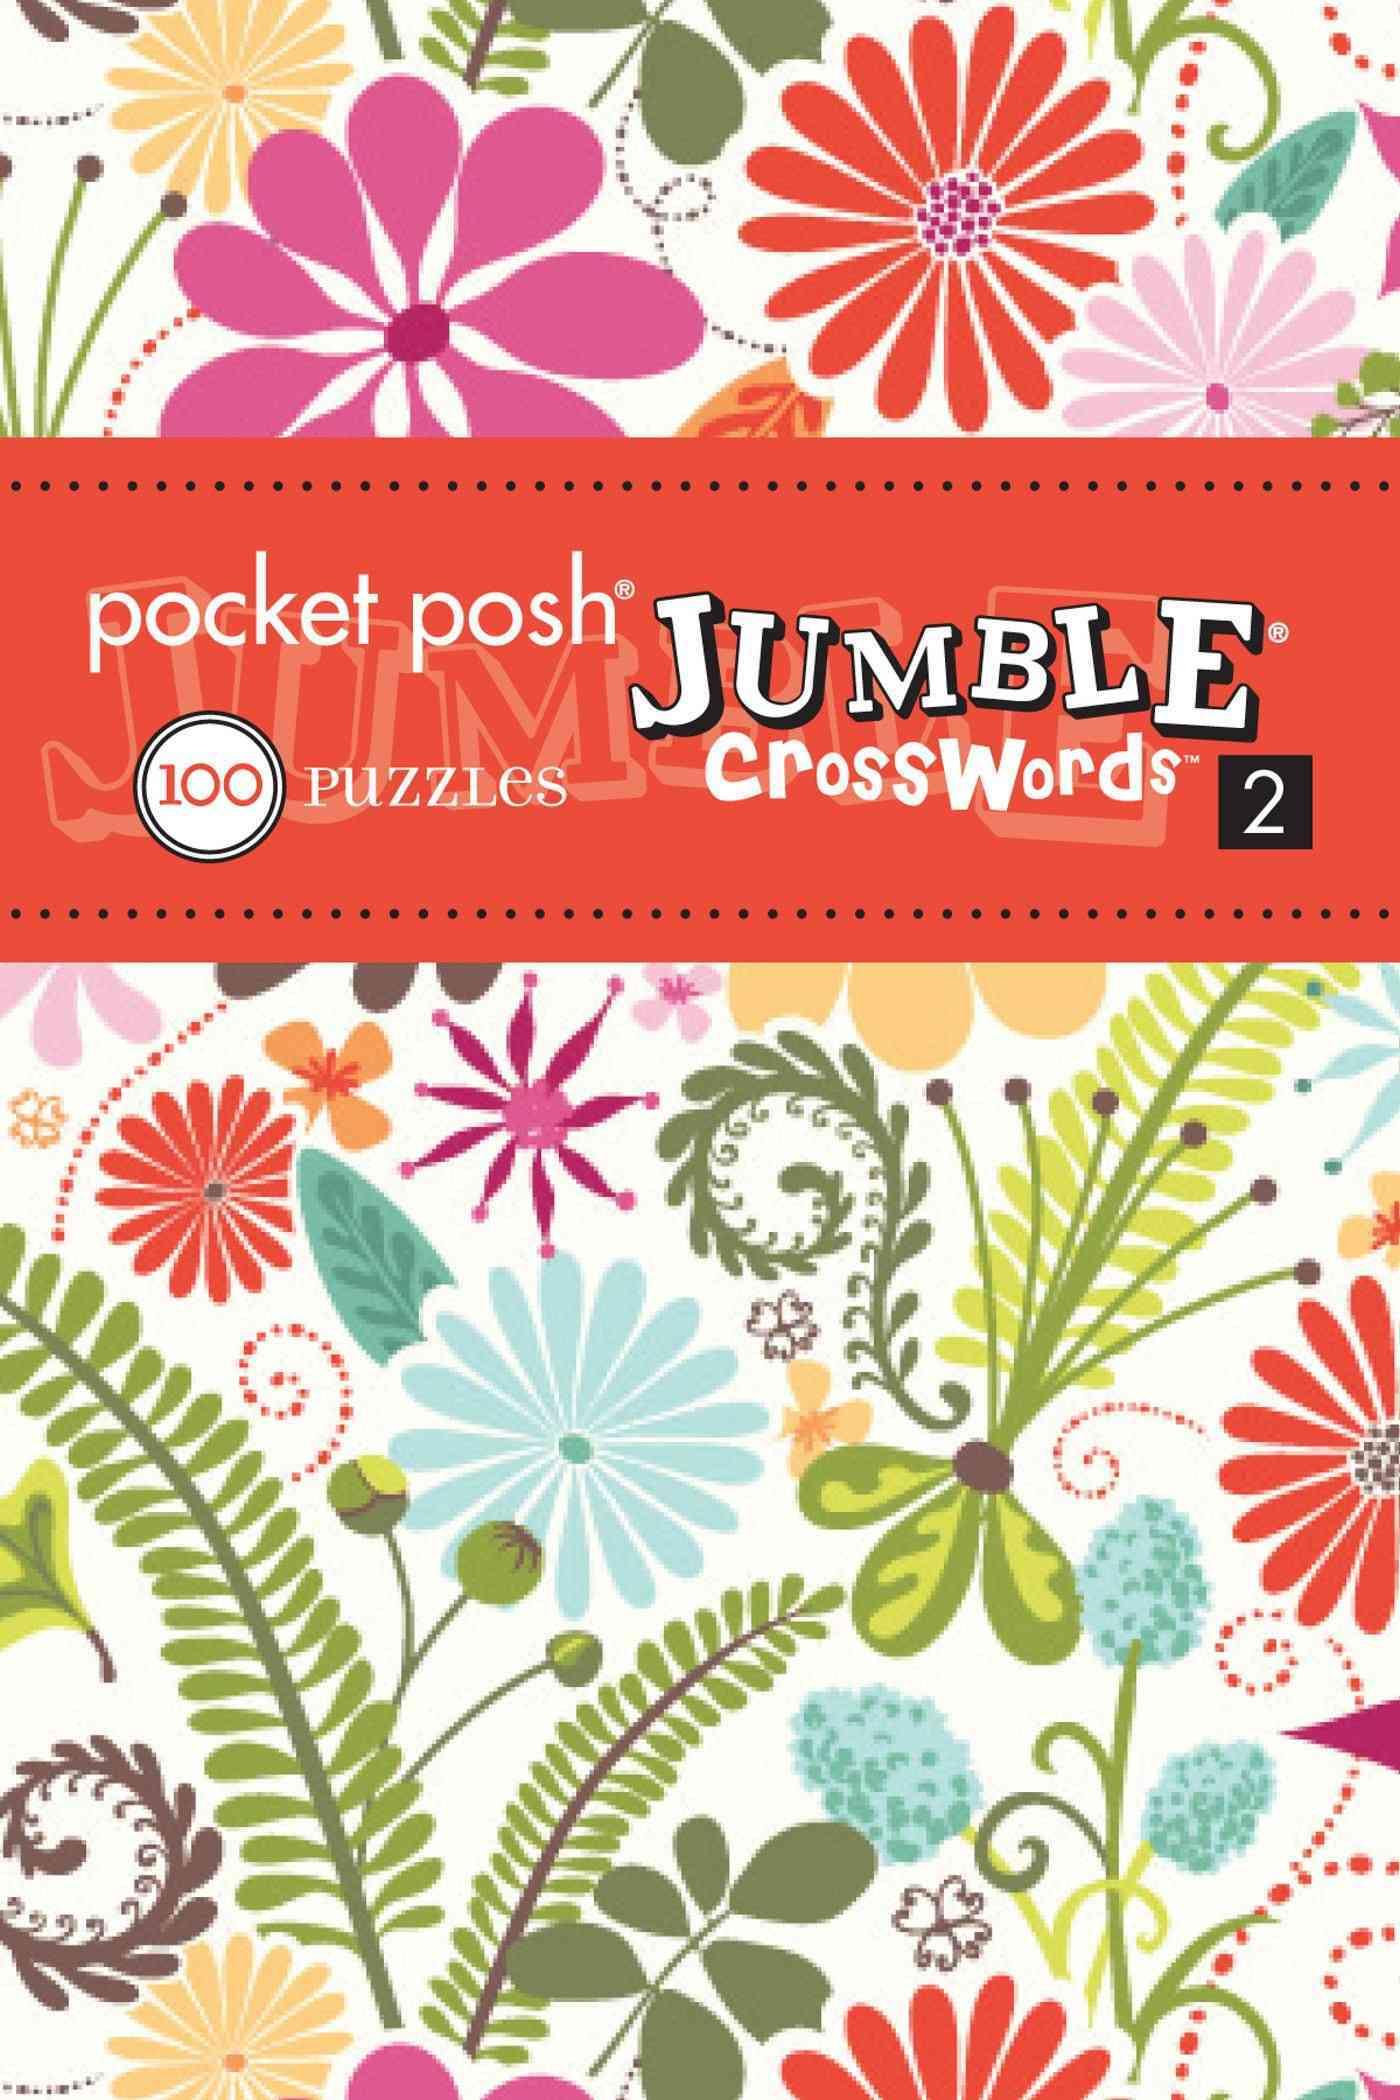 Pocket Posh Jumble Crosswords 2: 100 Puzzles (Paperback)